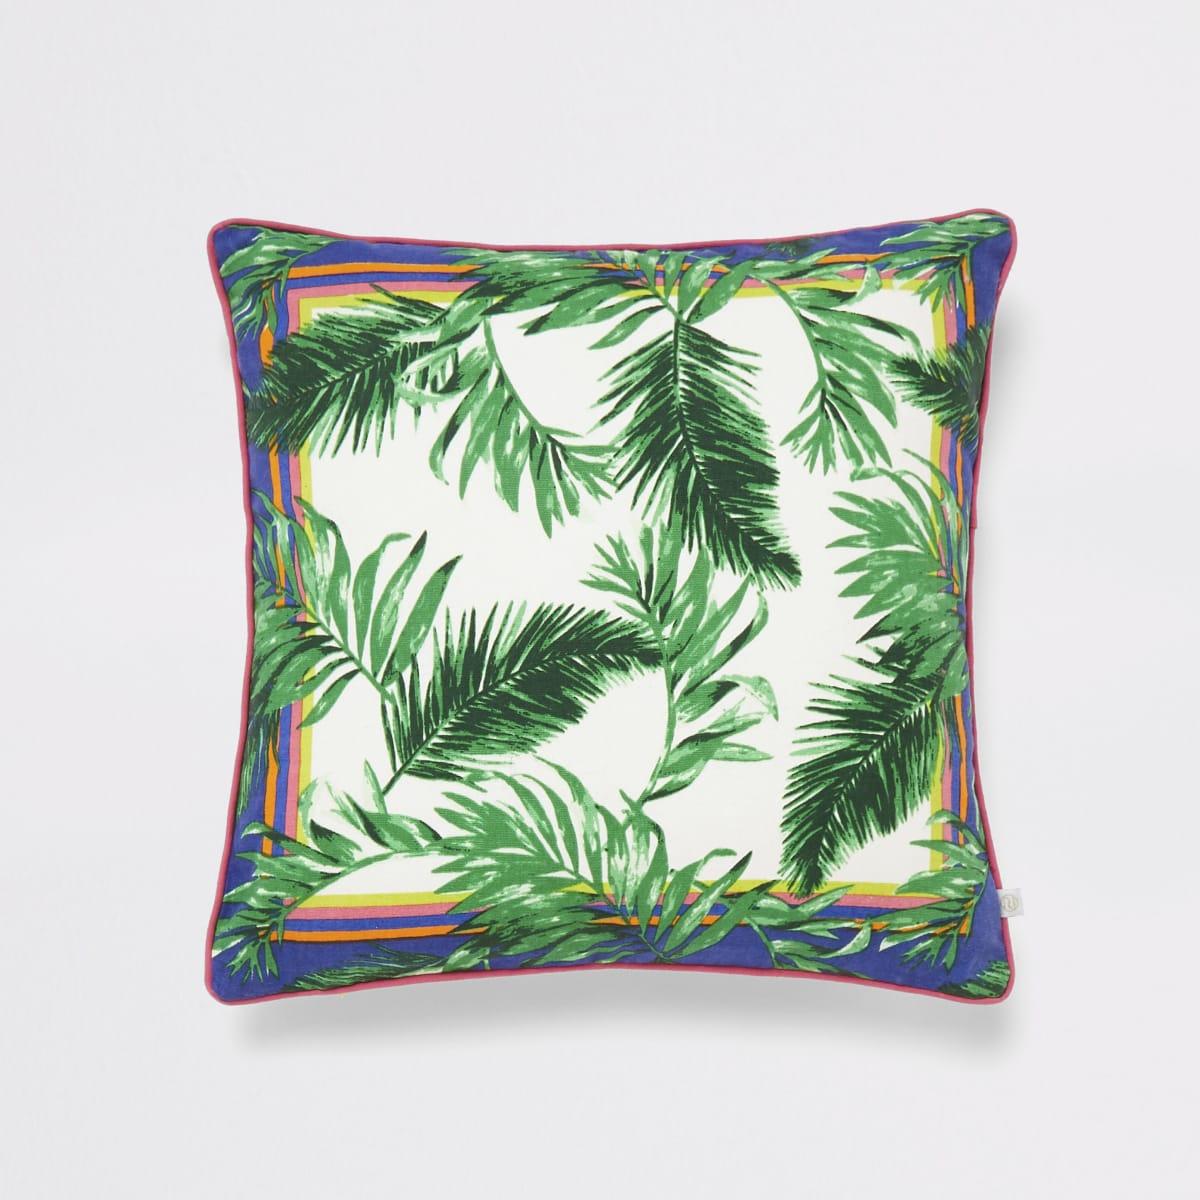 Green jungle print cushion cover